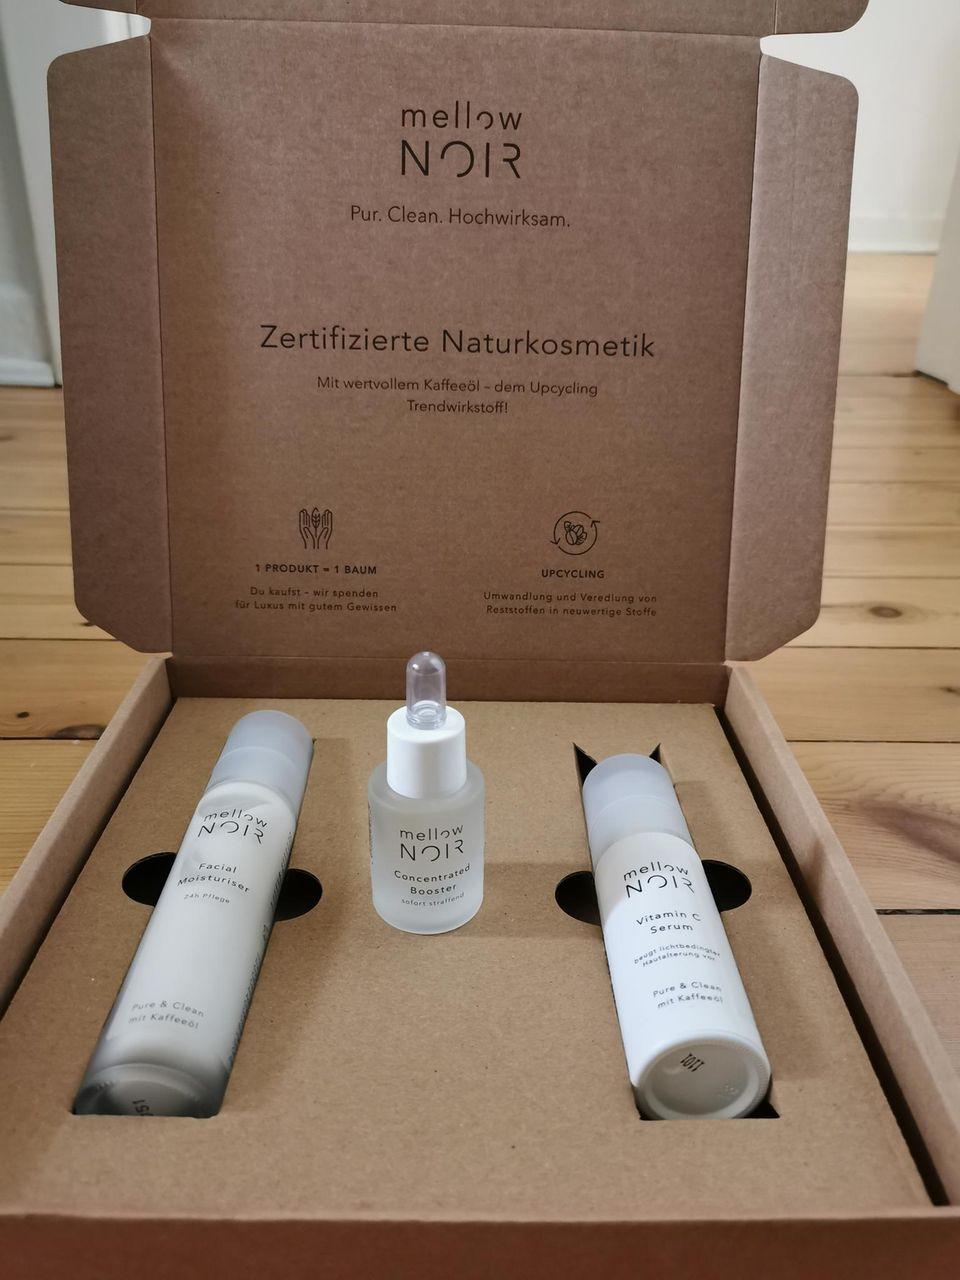 mellow NOIR: zertifzierte Naturkosmetik, Facial Moisturiser, Vitamin C Serum, Concentrated Booster, nachhaltige Verpackung